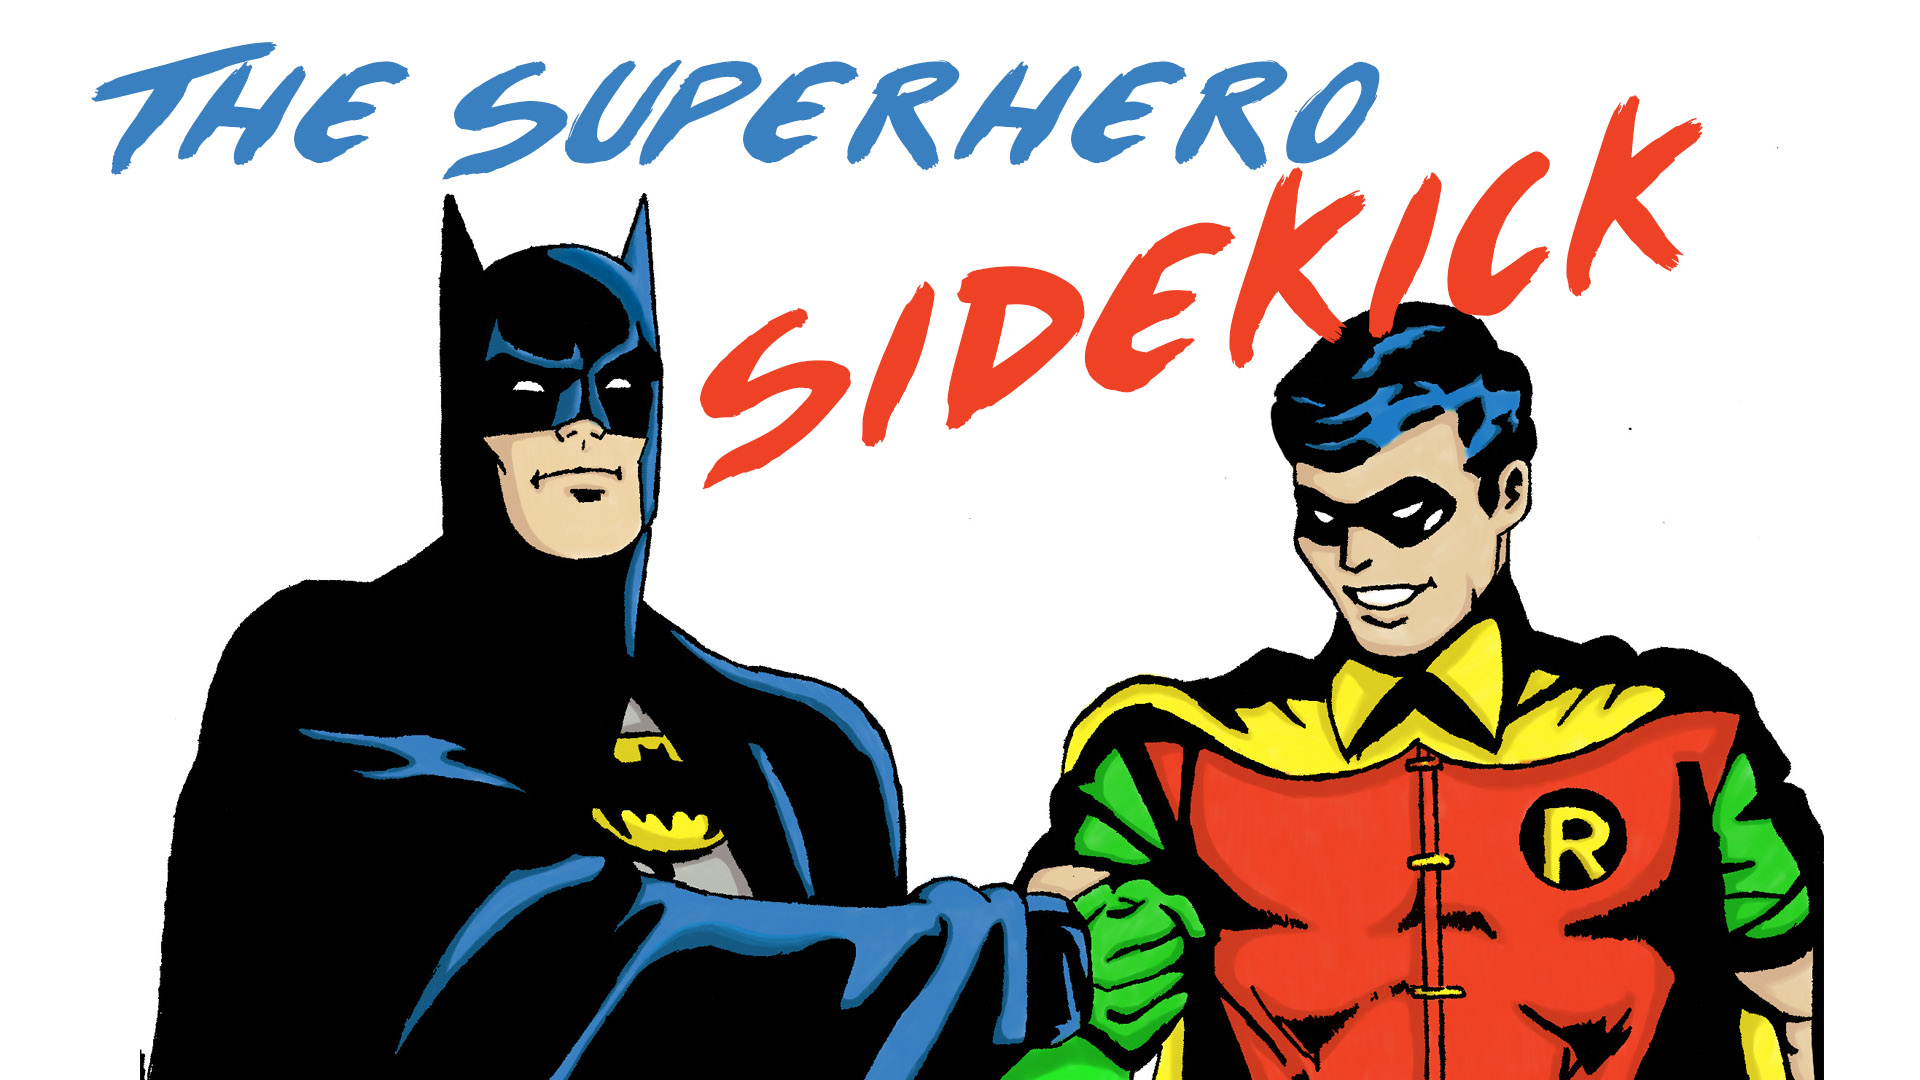 the superhero sidekick